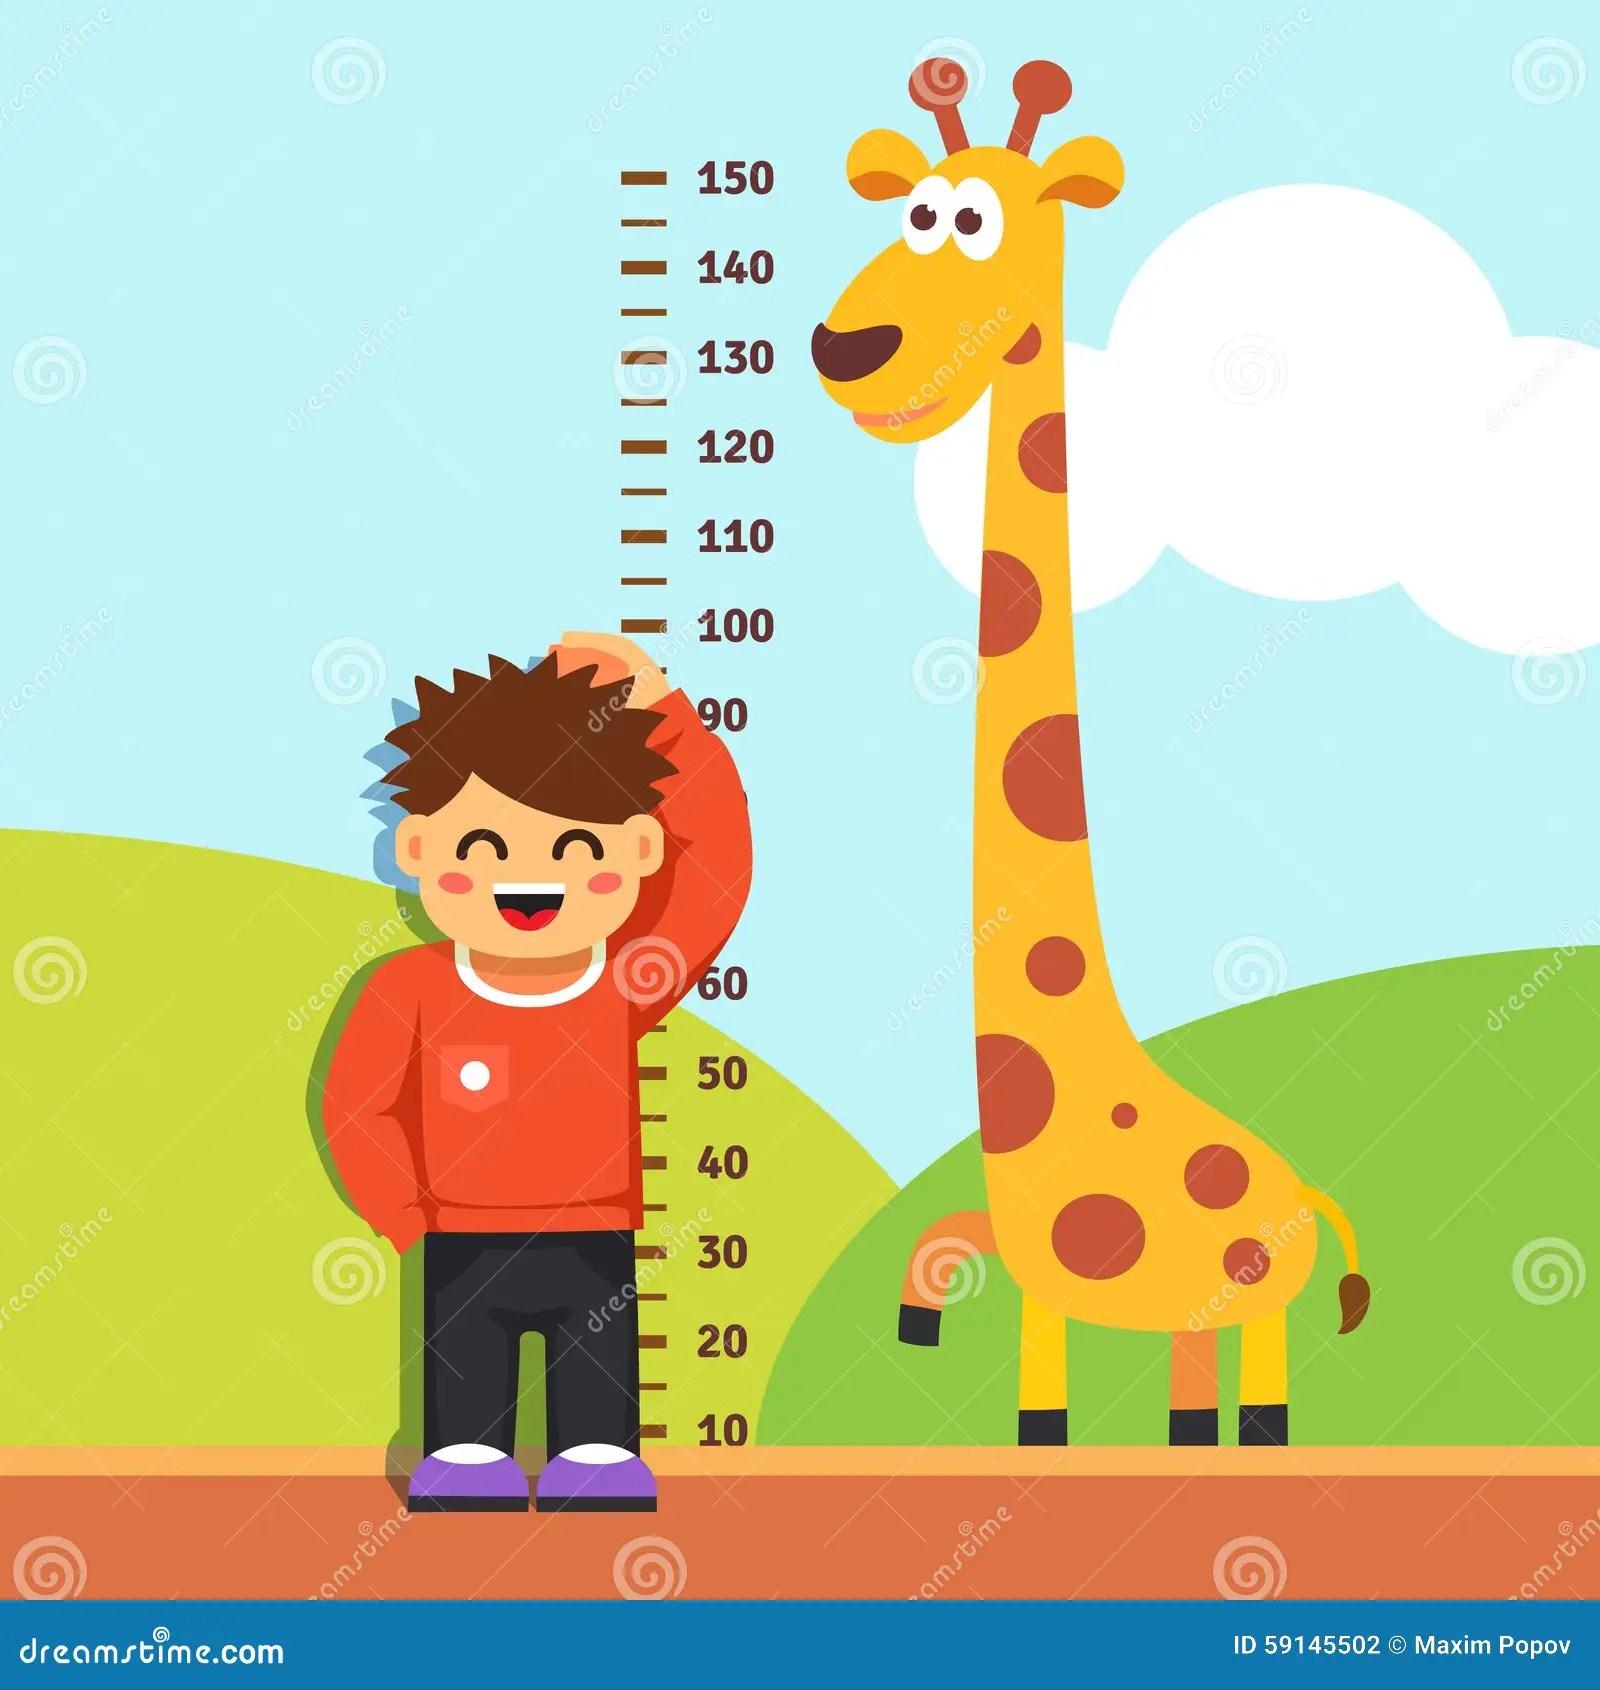 Boy Kid Measuring His Height At Kindergarten Wall Stock